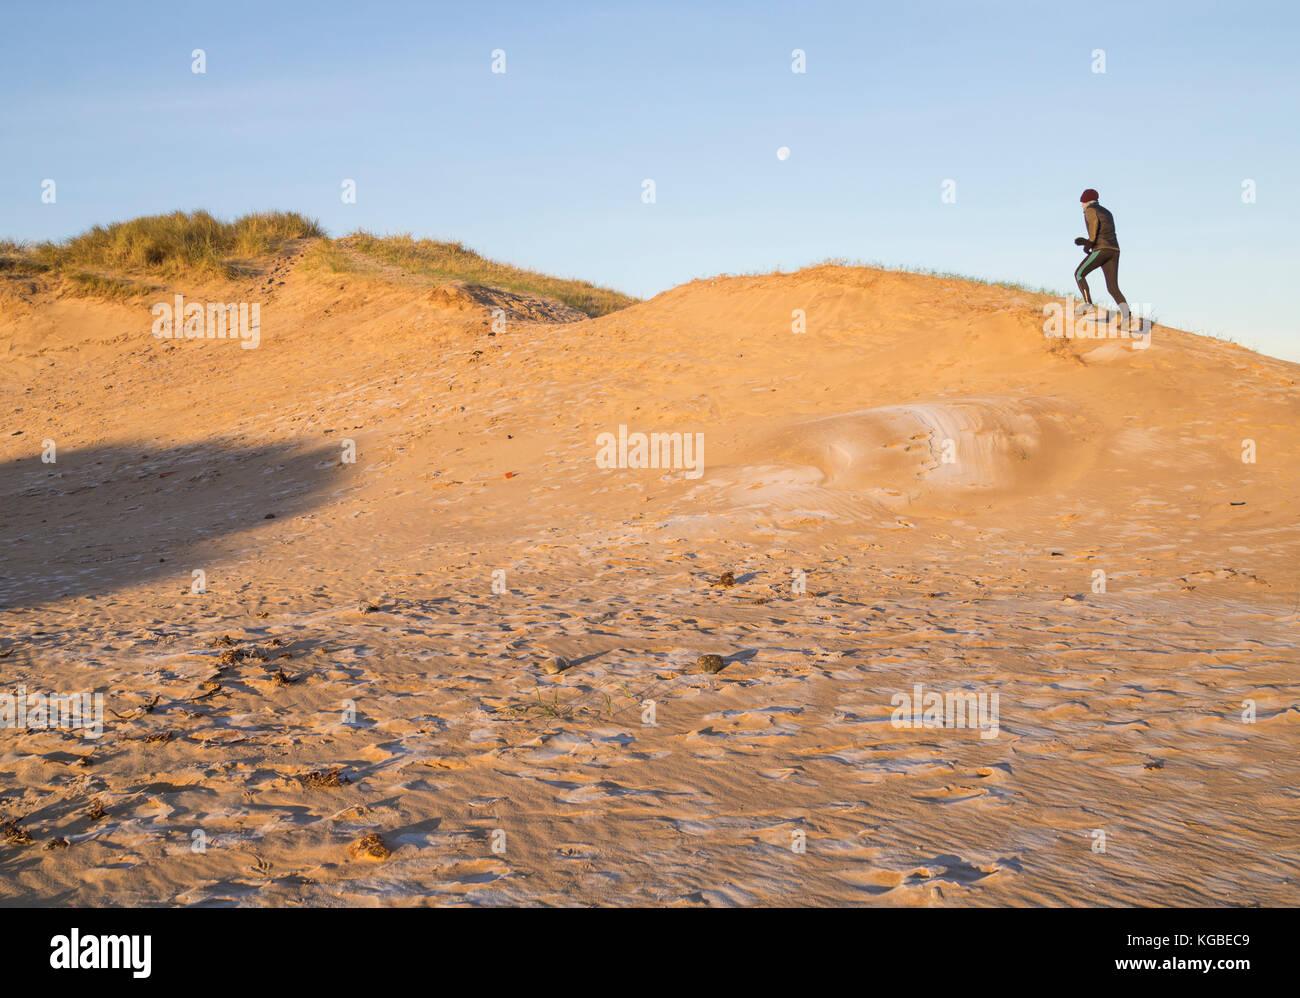 Seaton carew dunes